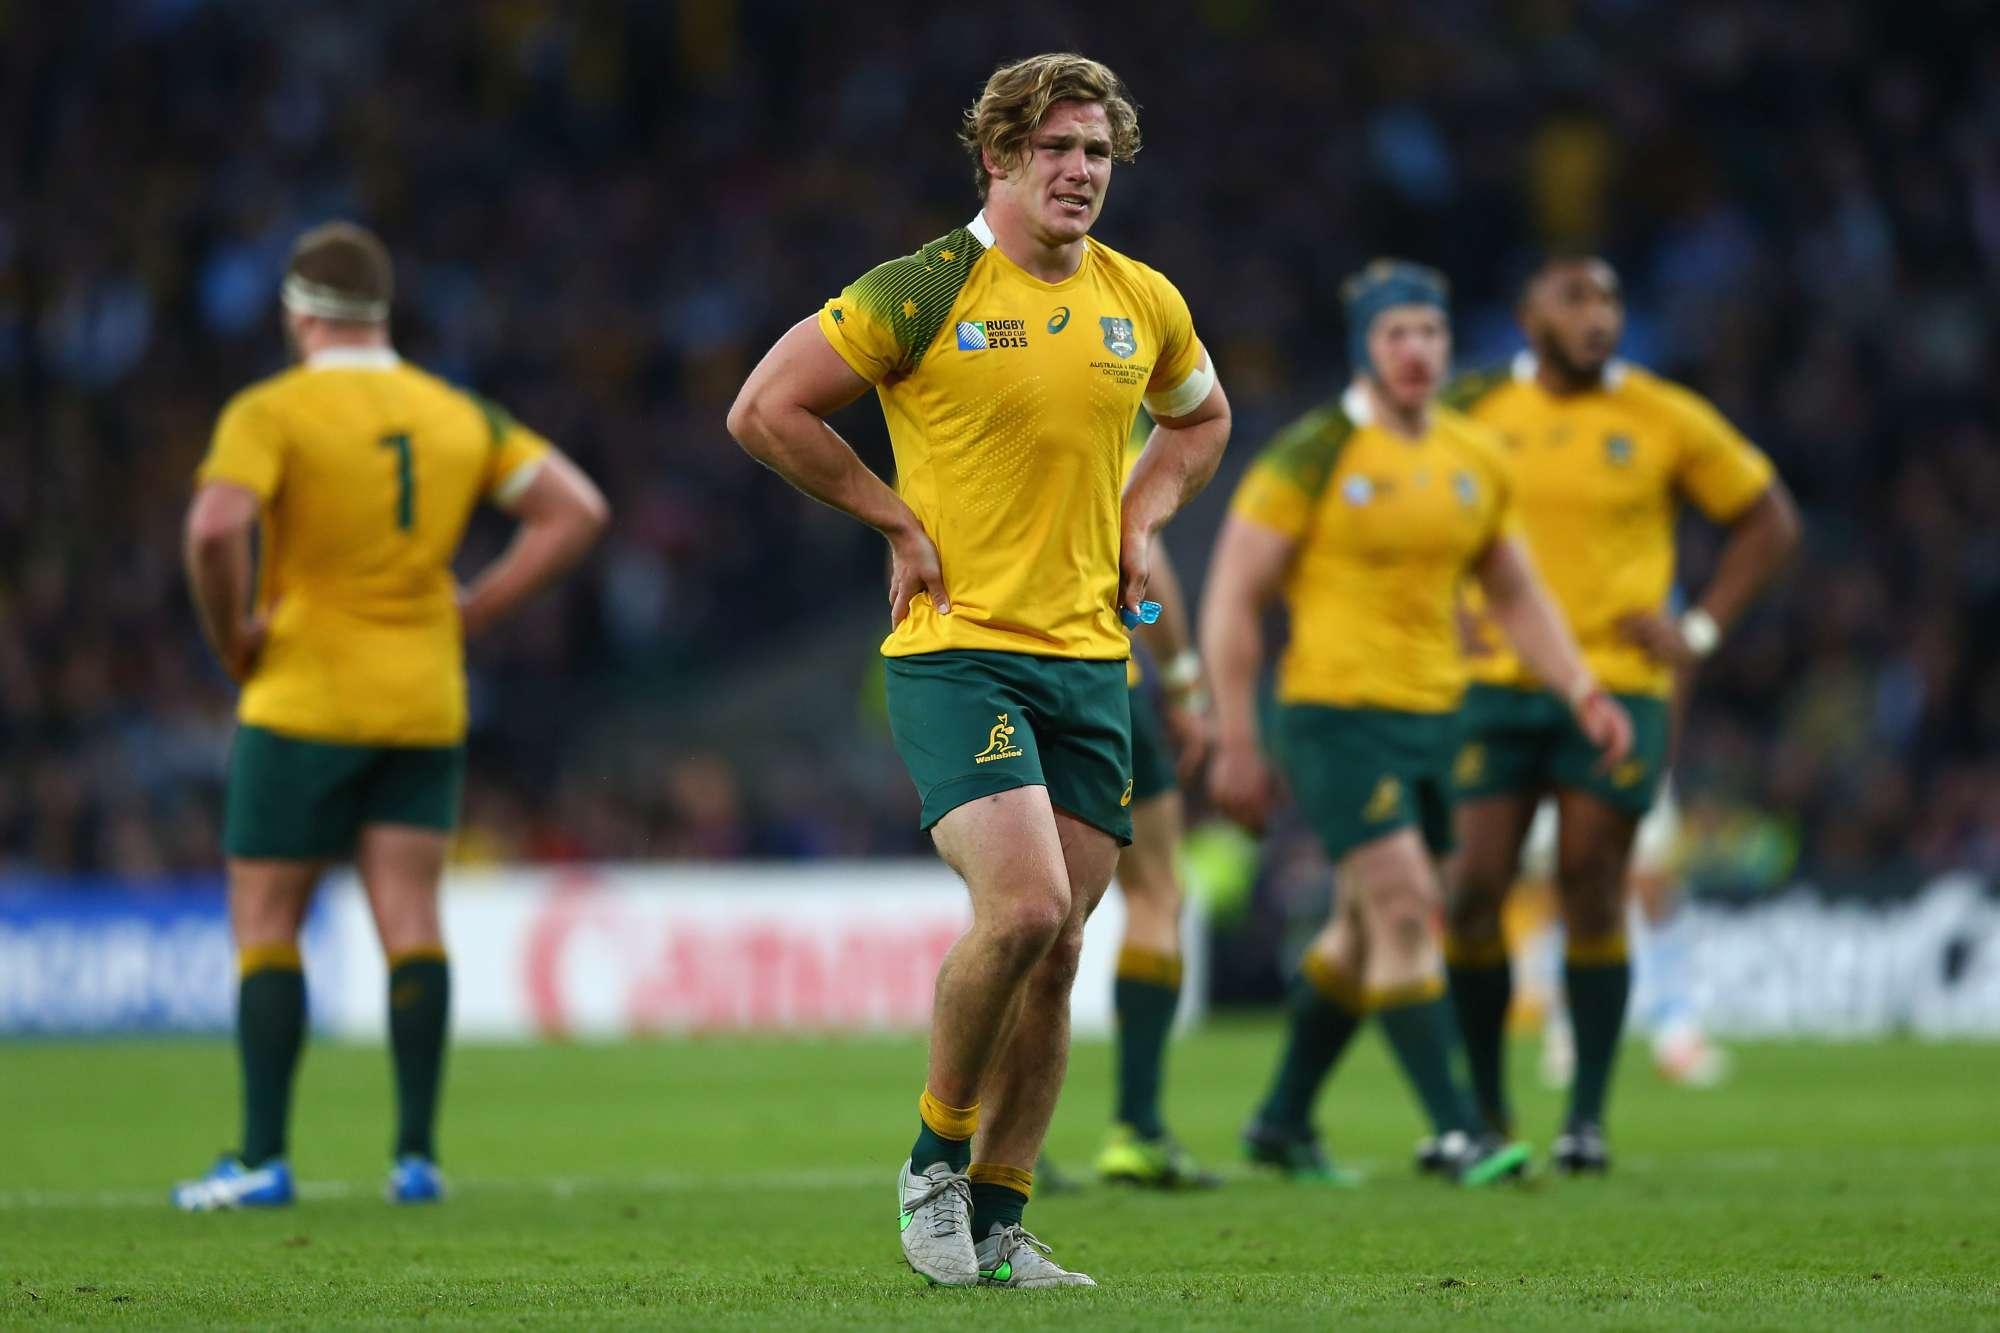 Michael Hooper: lui e la sua Australia cercano l'upset con la Nuova Zelanda